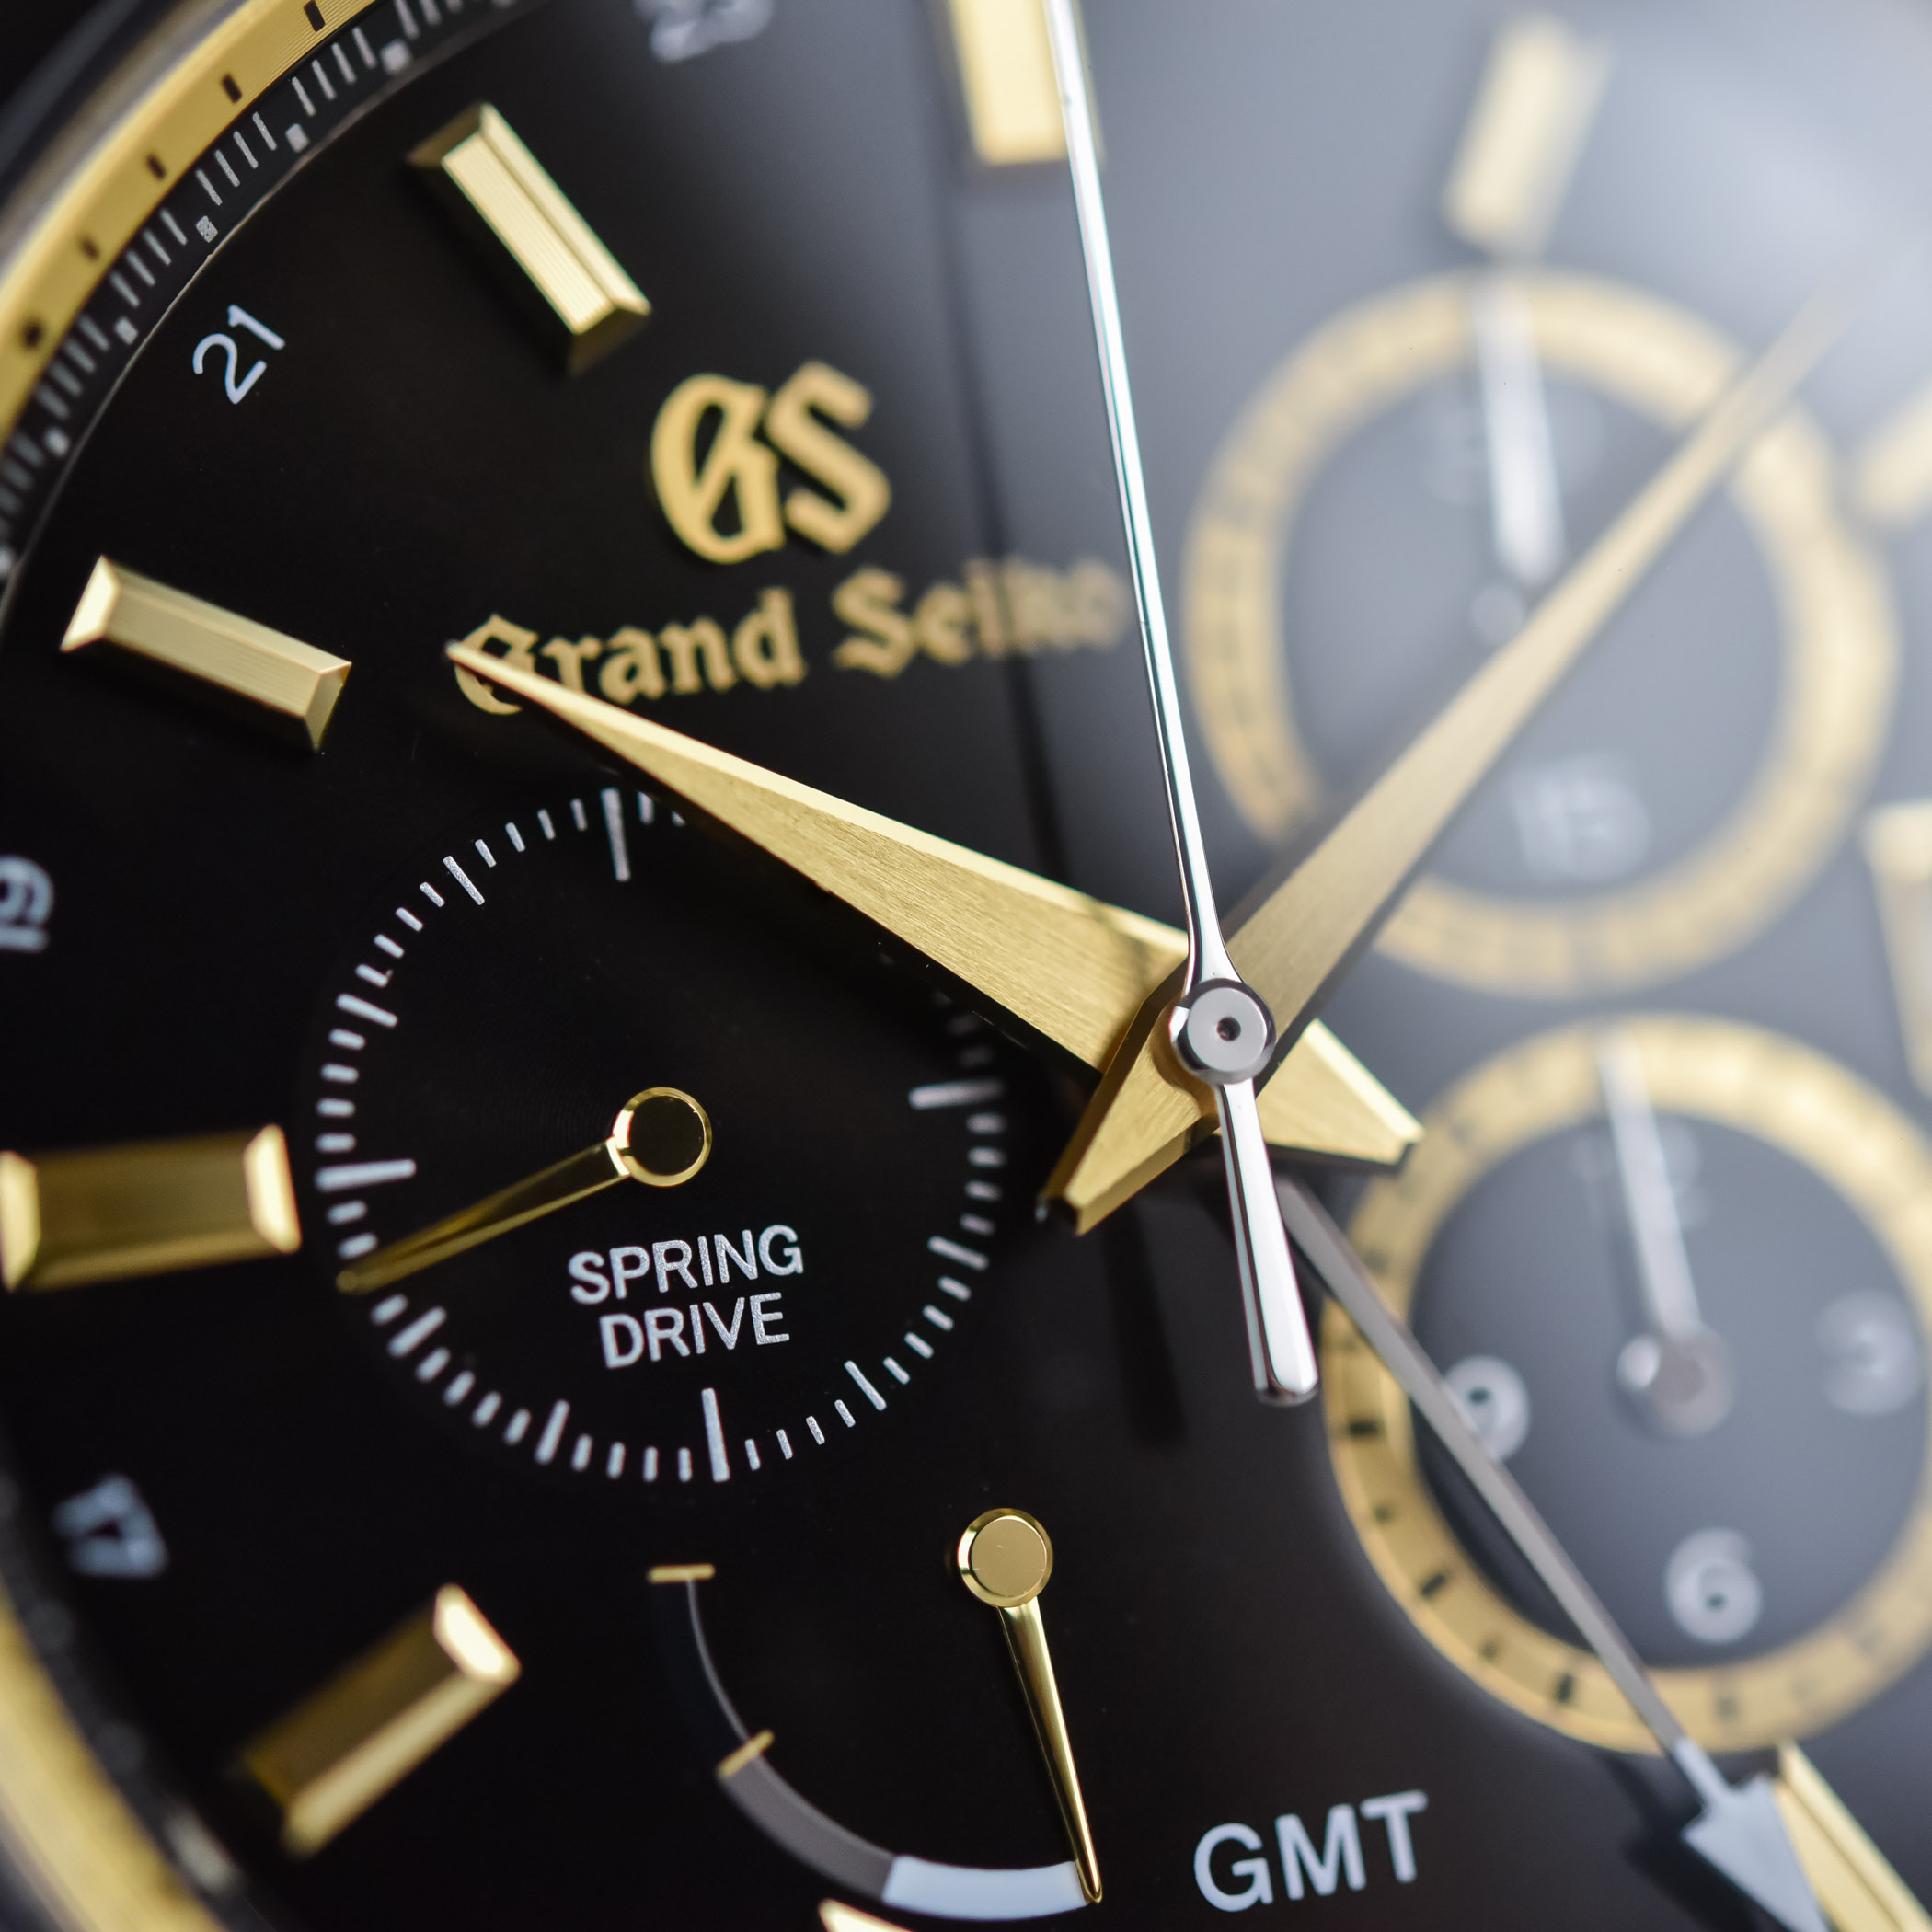 Grand Seiko Spring Drive Chronograph GMT SBGC240 Limited Edition Seiko 140th Anniversary